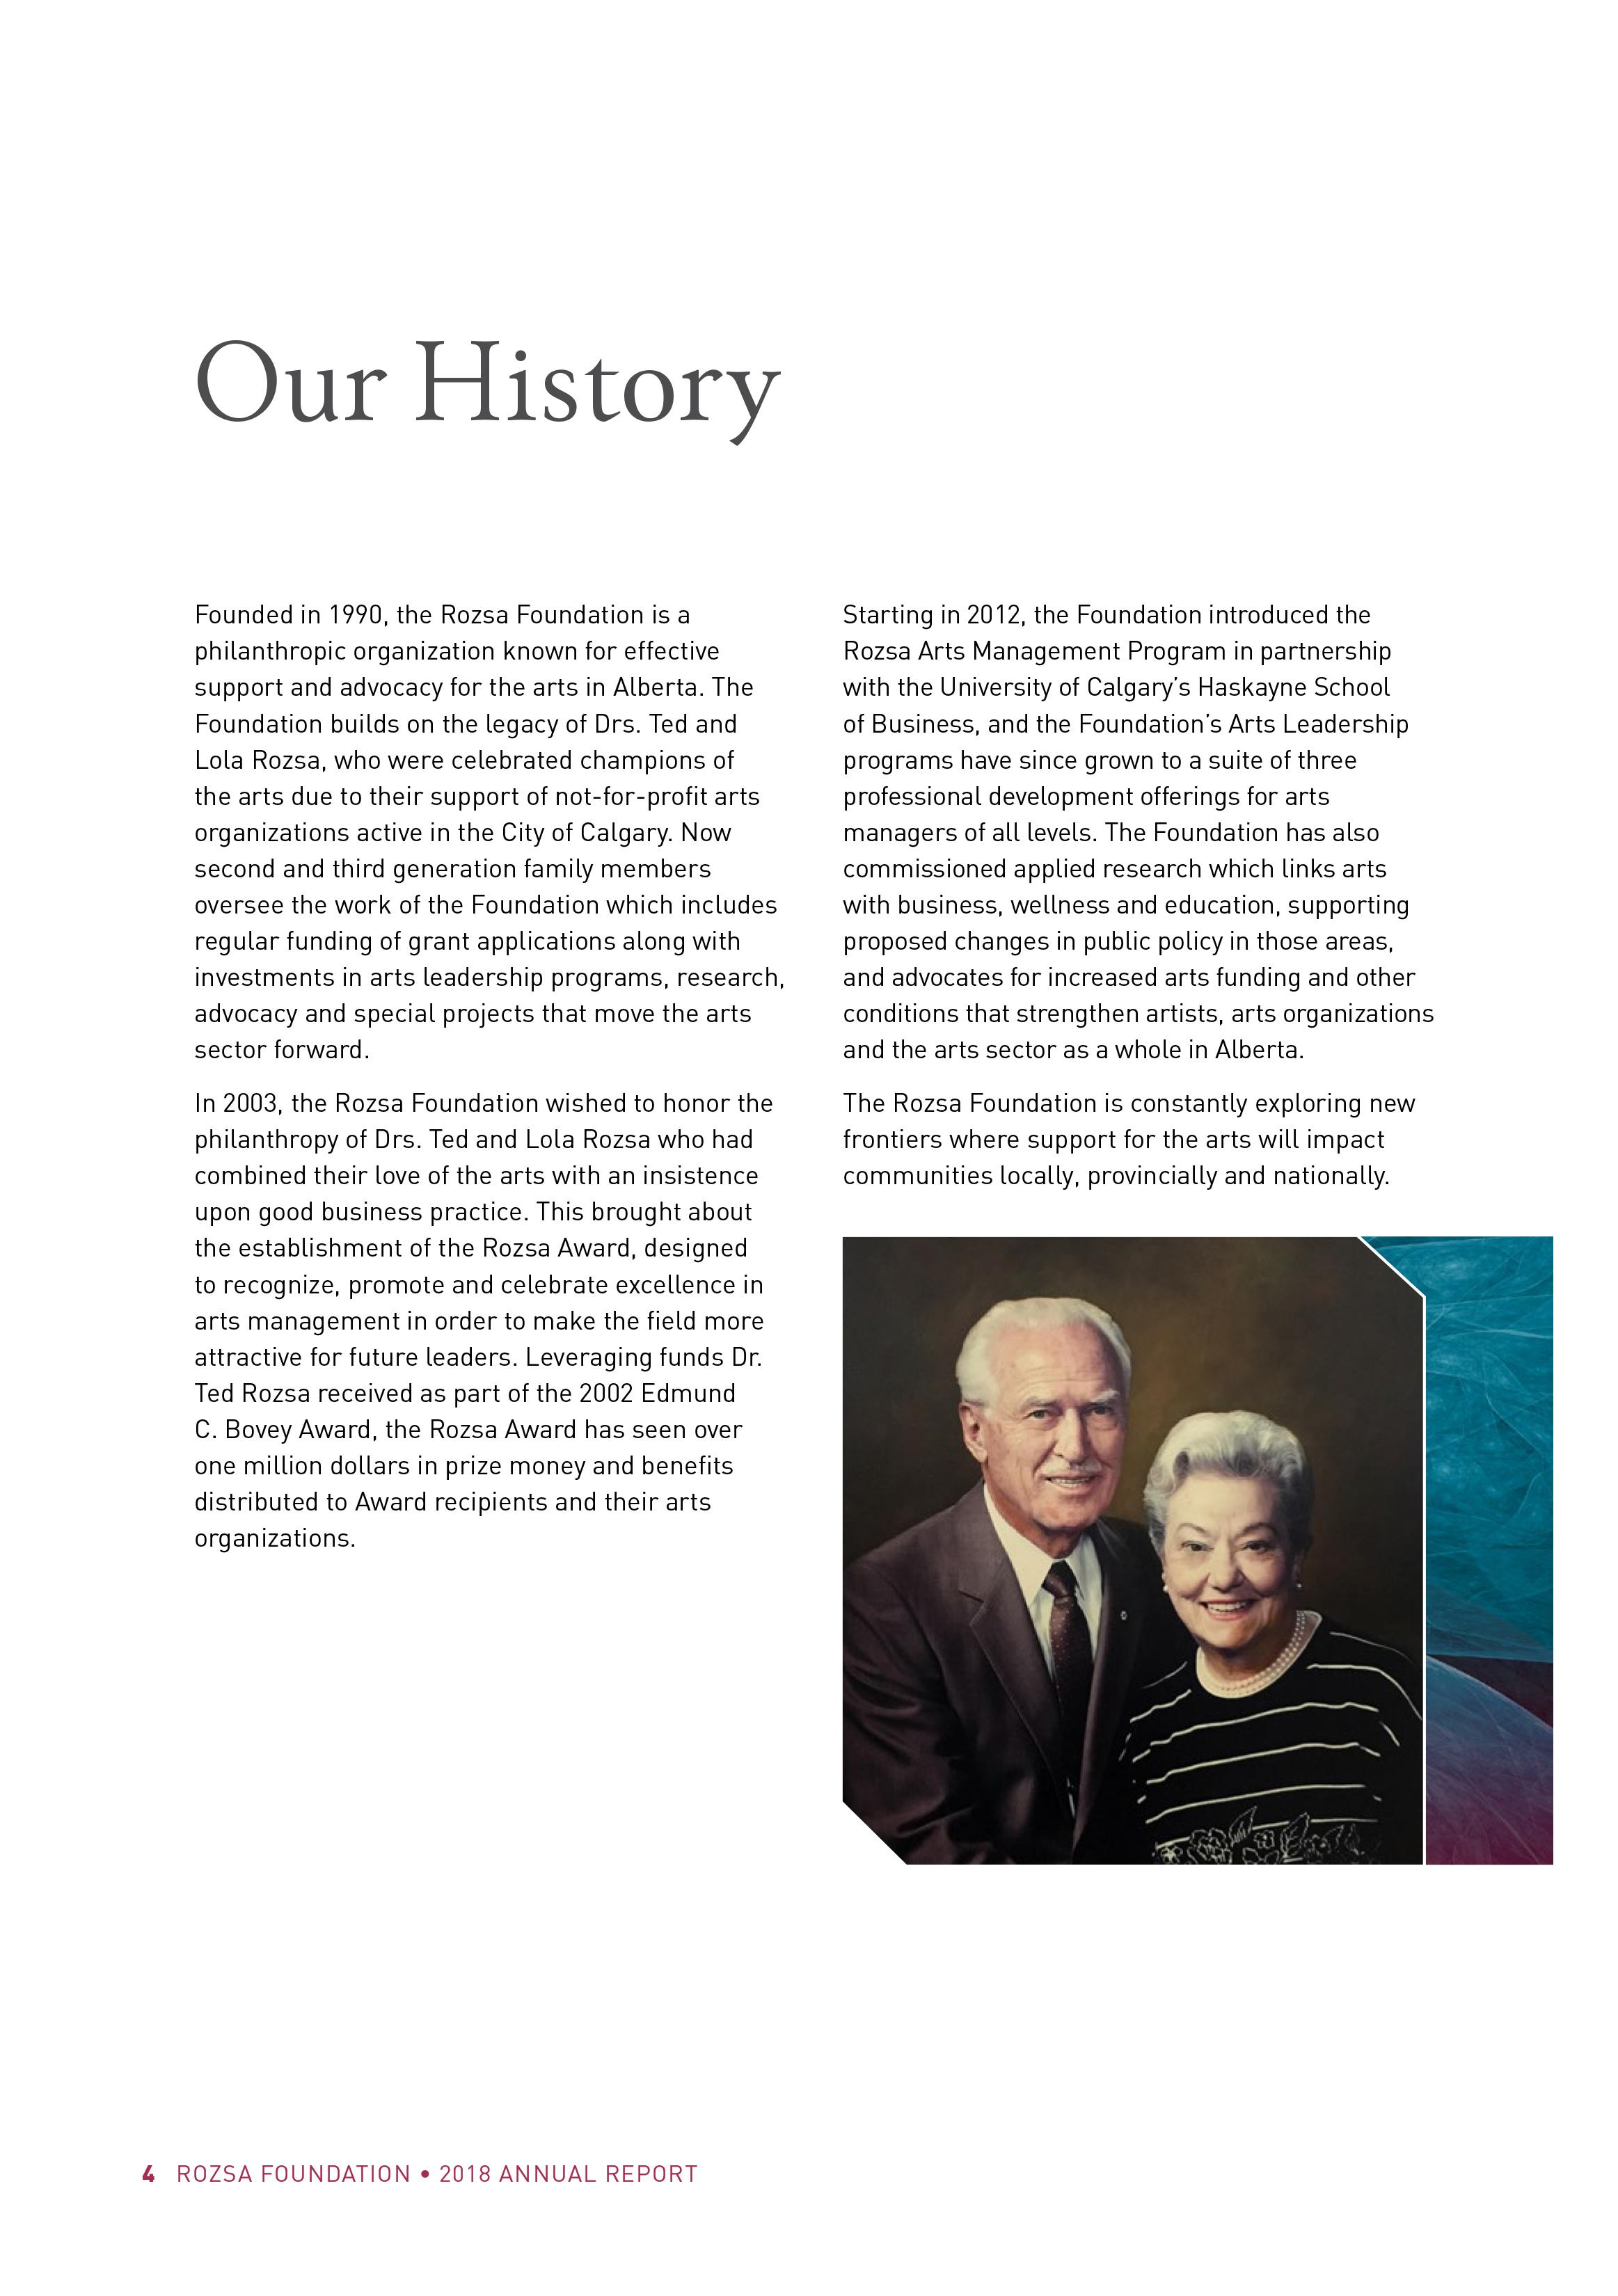 2018 Rozsa Foundation Annual Report-6